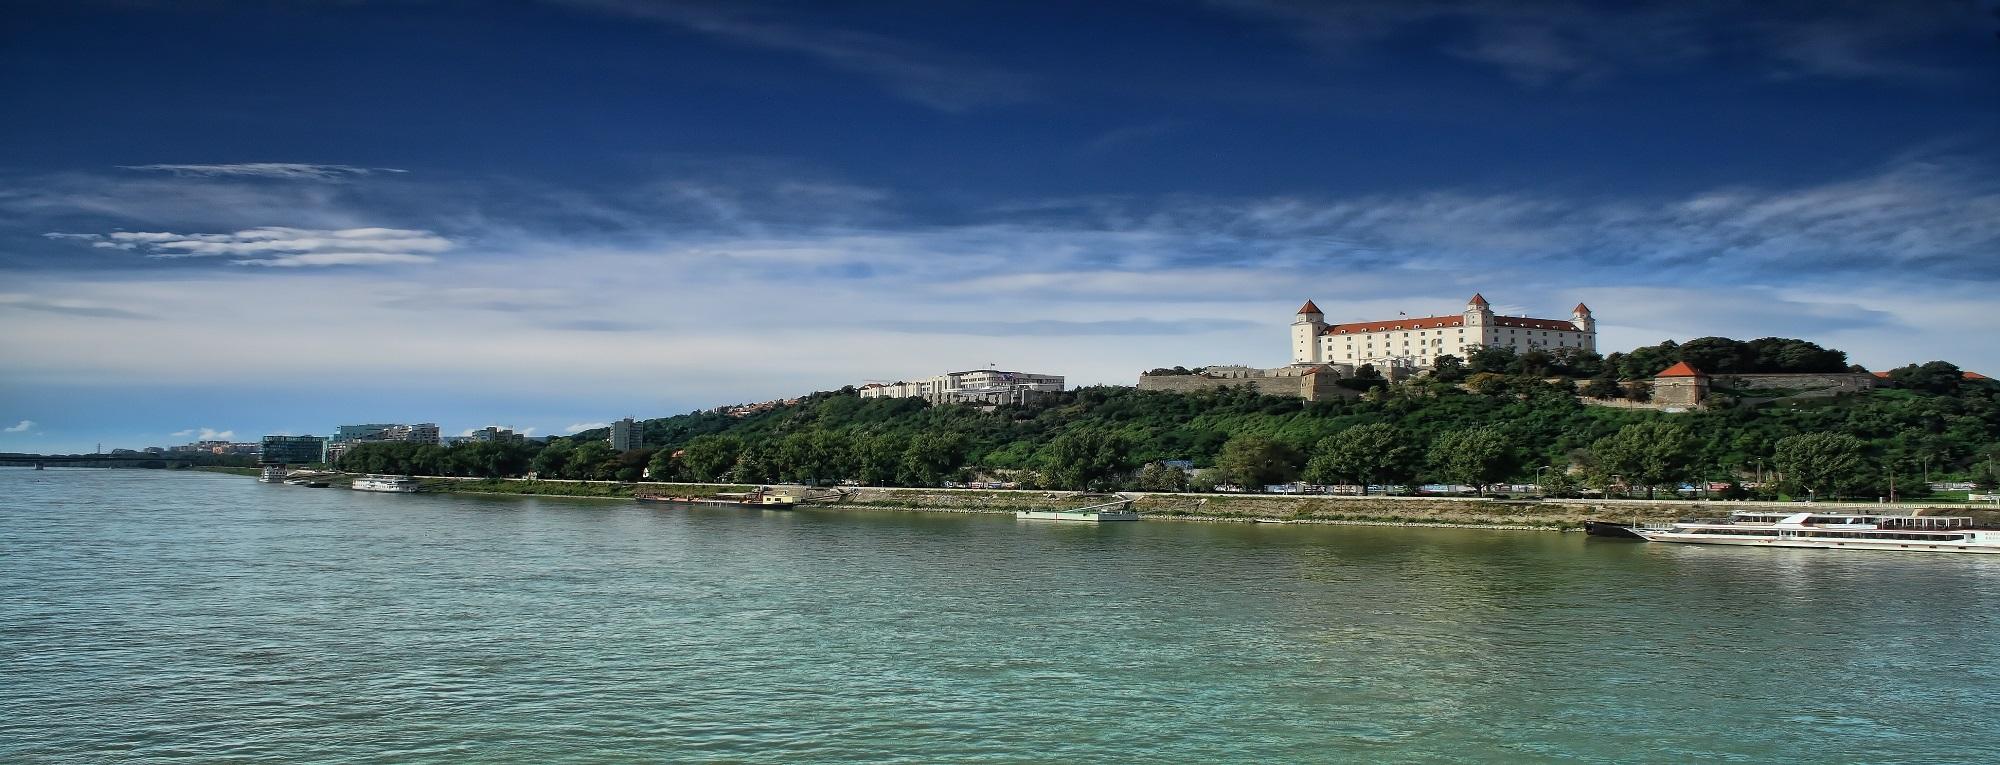 Bratislavavisit